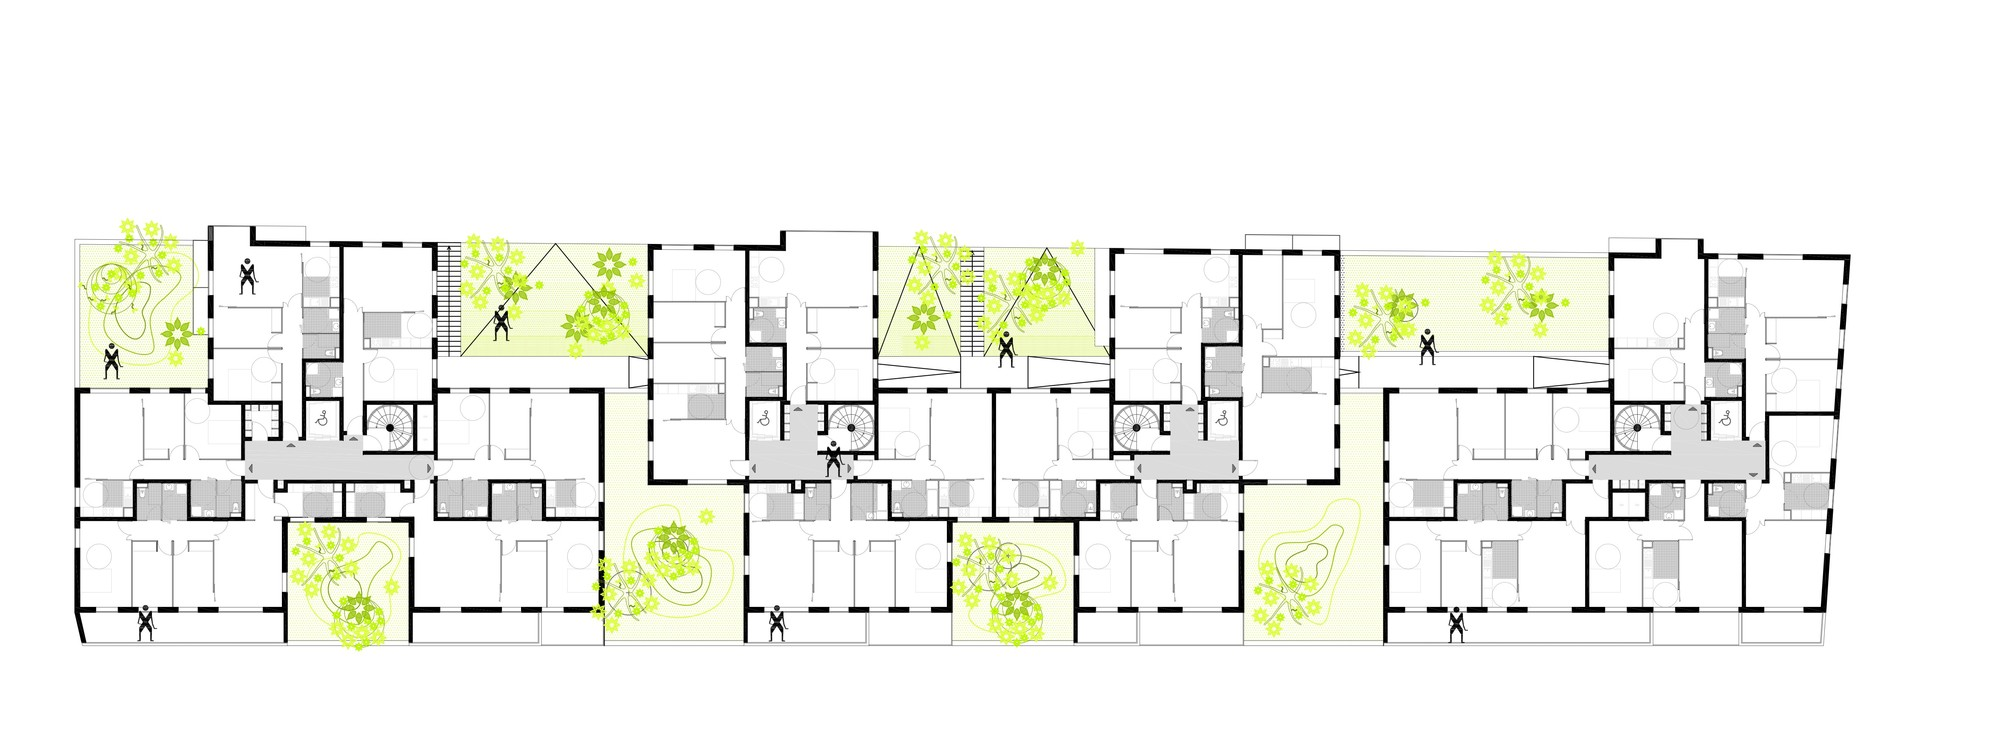 Gallery of apartment blocks in nanterre x tu 22 for Apartment block plans